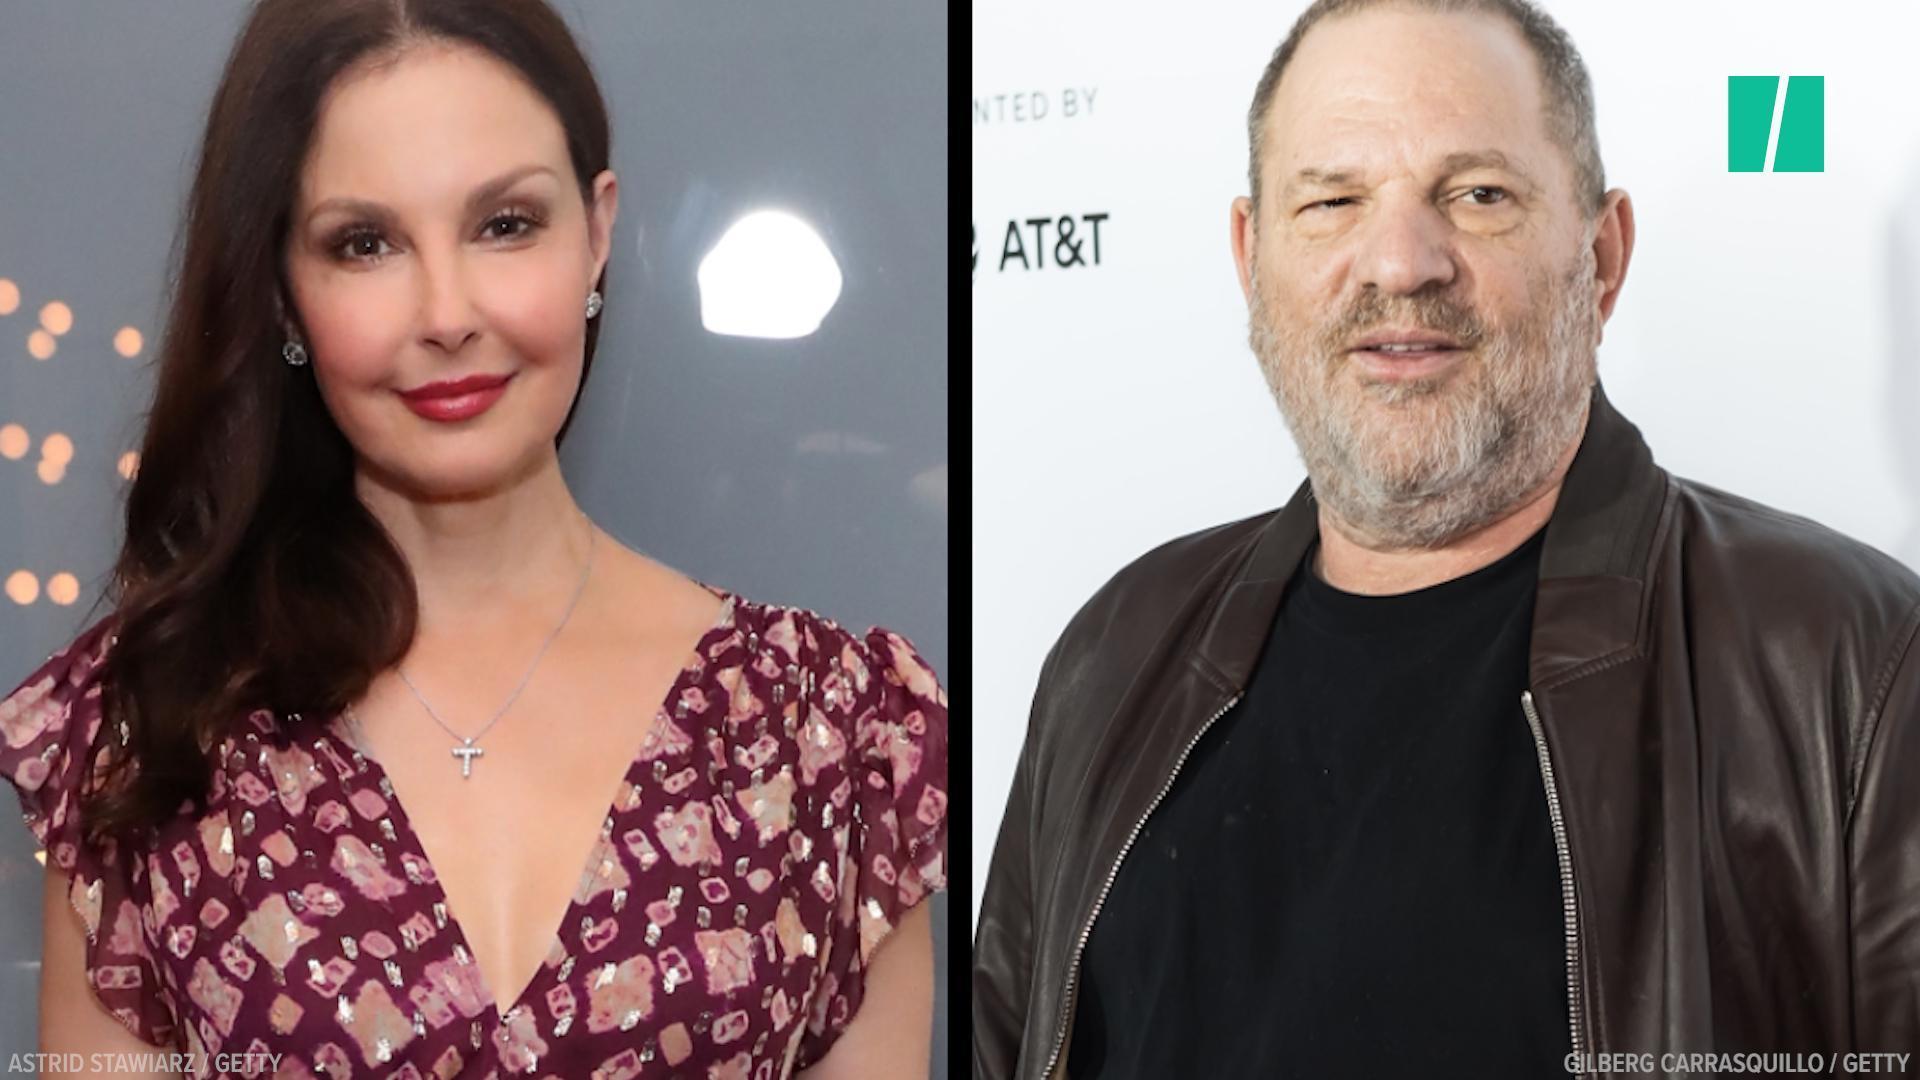 Ashley Judd Isn't Part Of The Harvey Weinstein Civil Settlement